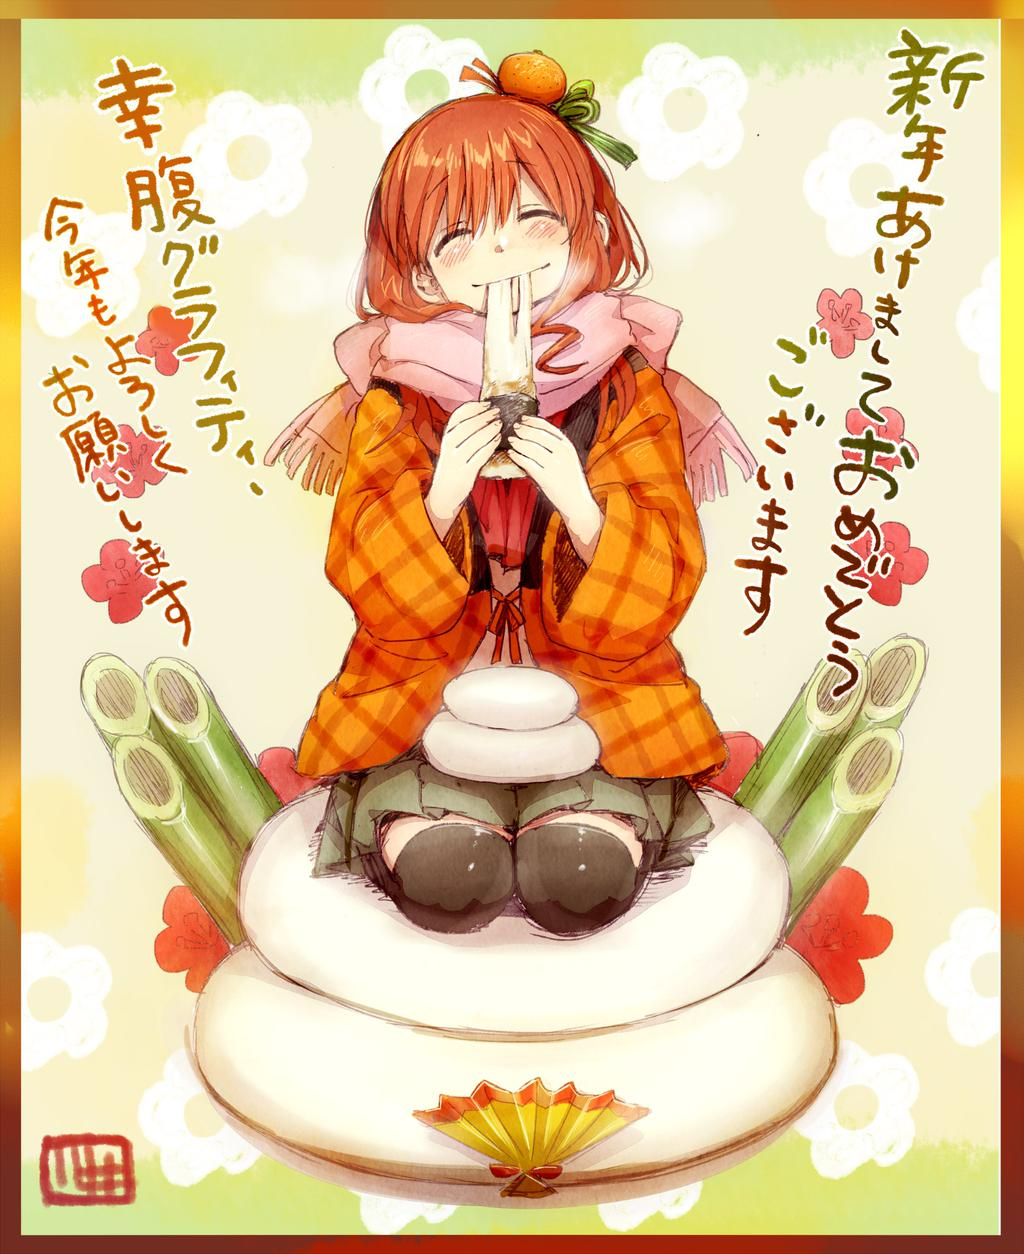 2015 New Year Greetings Anime Style haruhichan.com Koufuku Graffiti Happy Cooking Graffiti